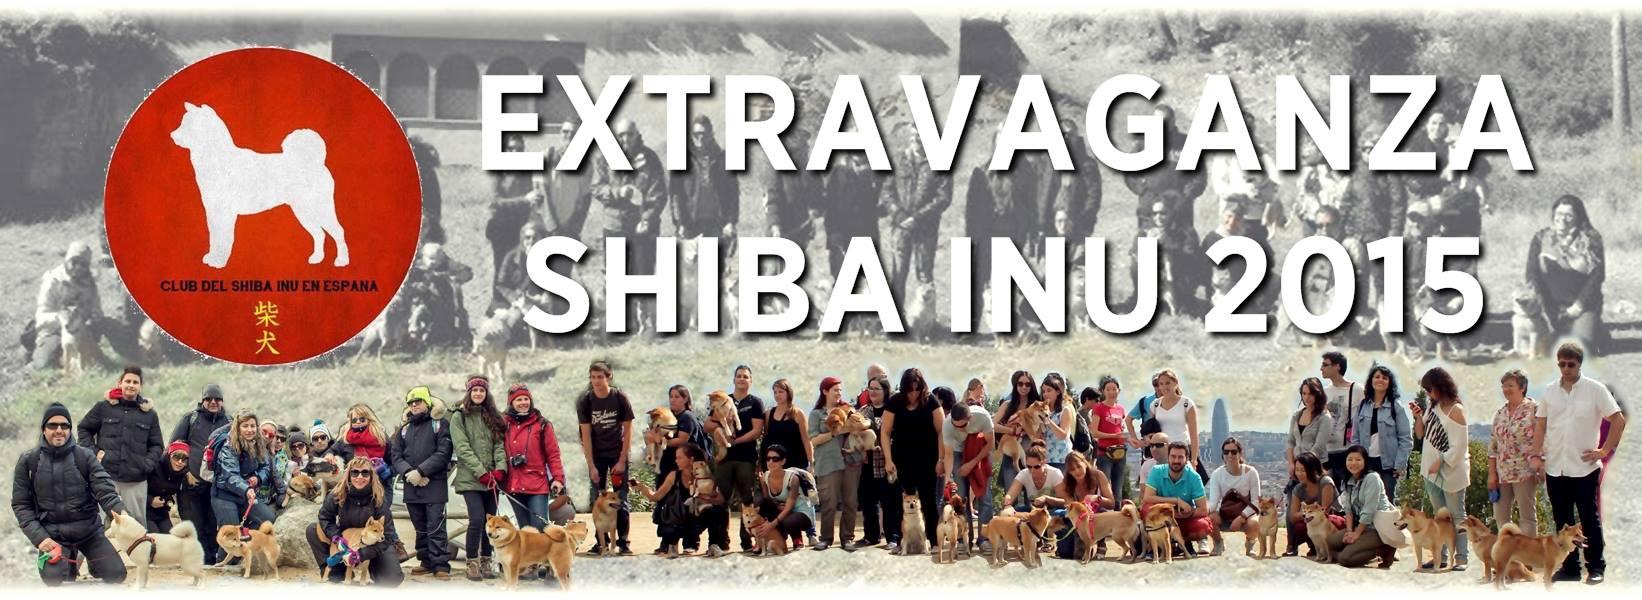 18/10/15 – Extravaganza Shiba Inu 2105